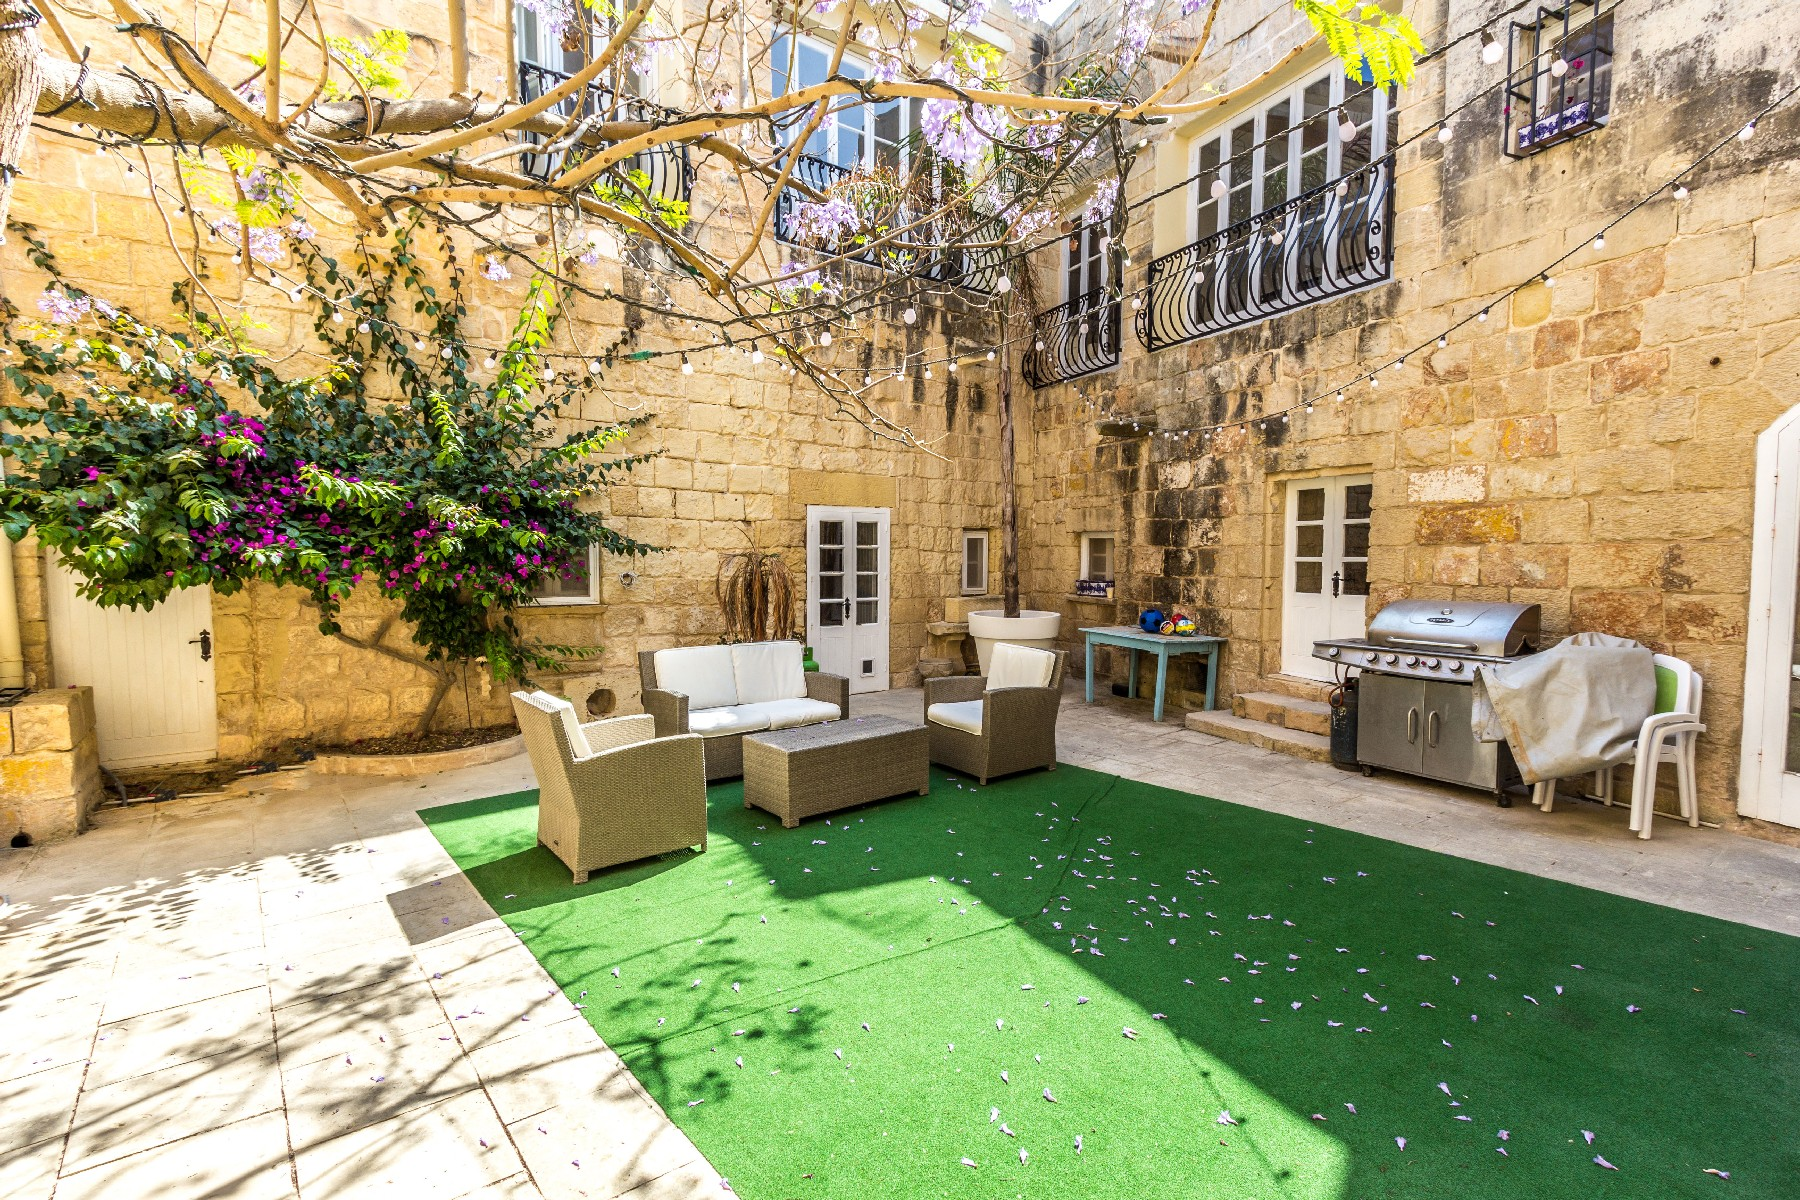 Malta Property for sale in Malta, Gharghur